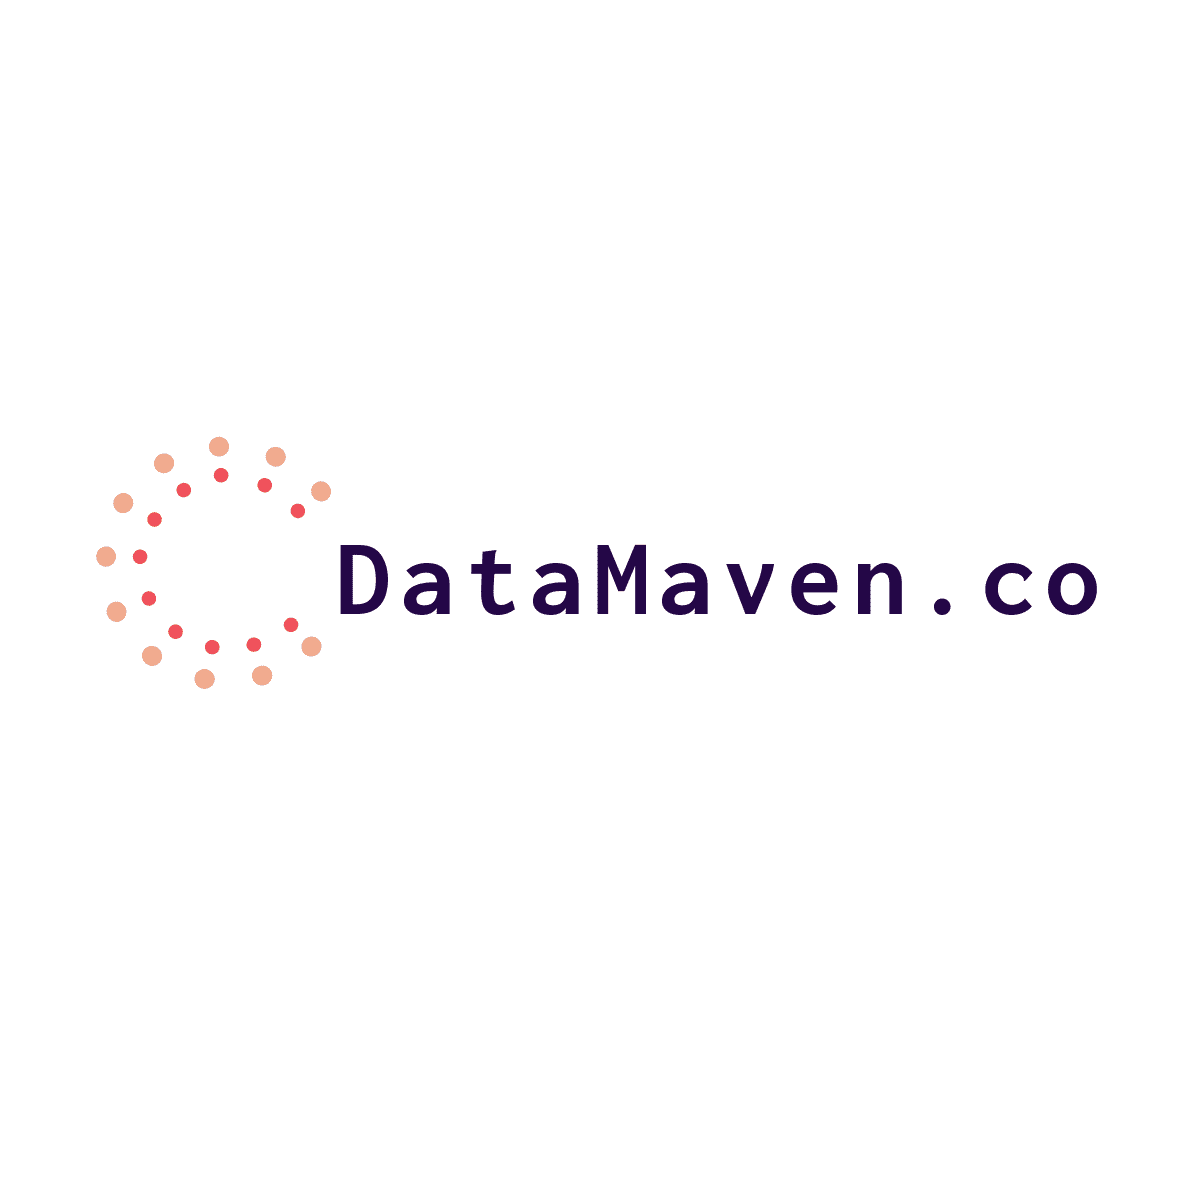 DataMaven.co